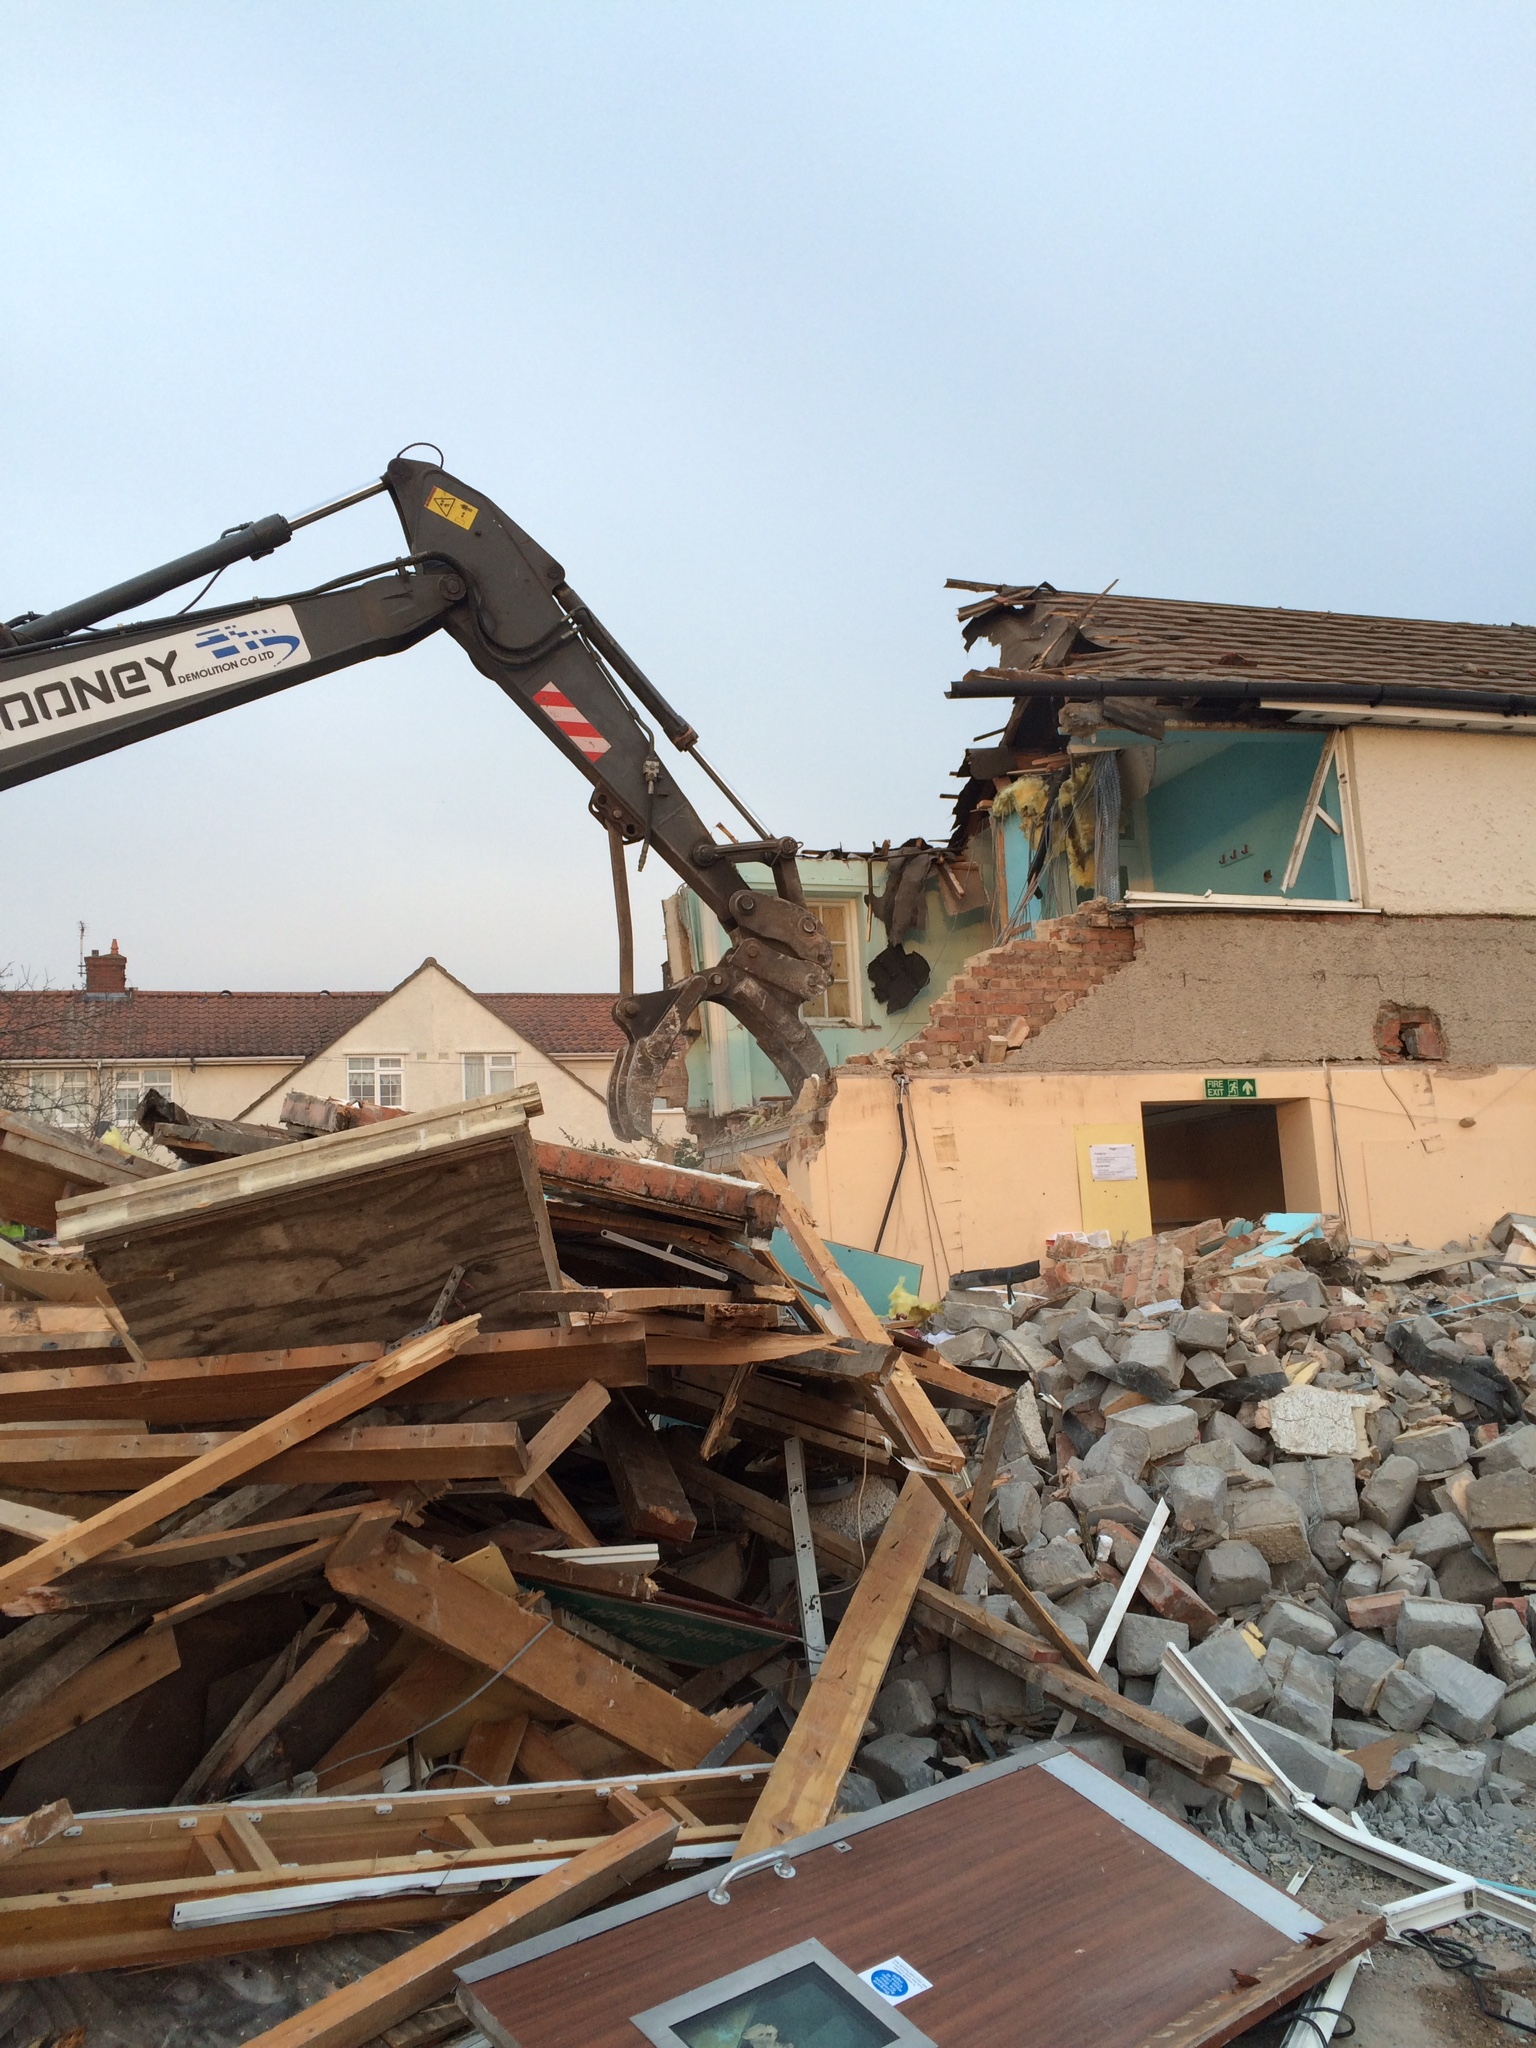 During Demolition